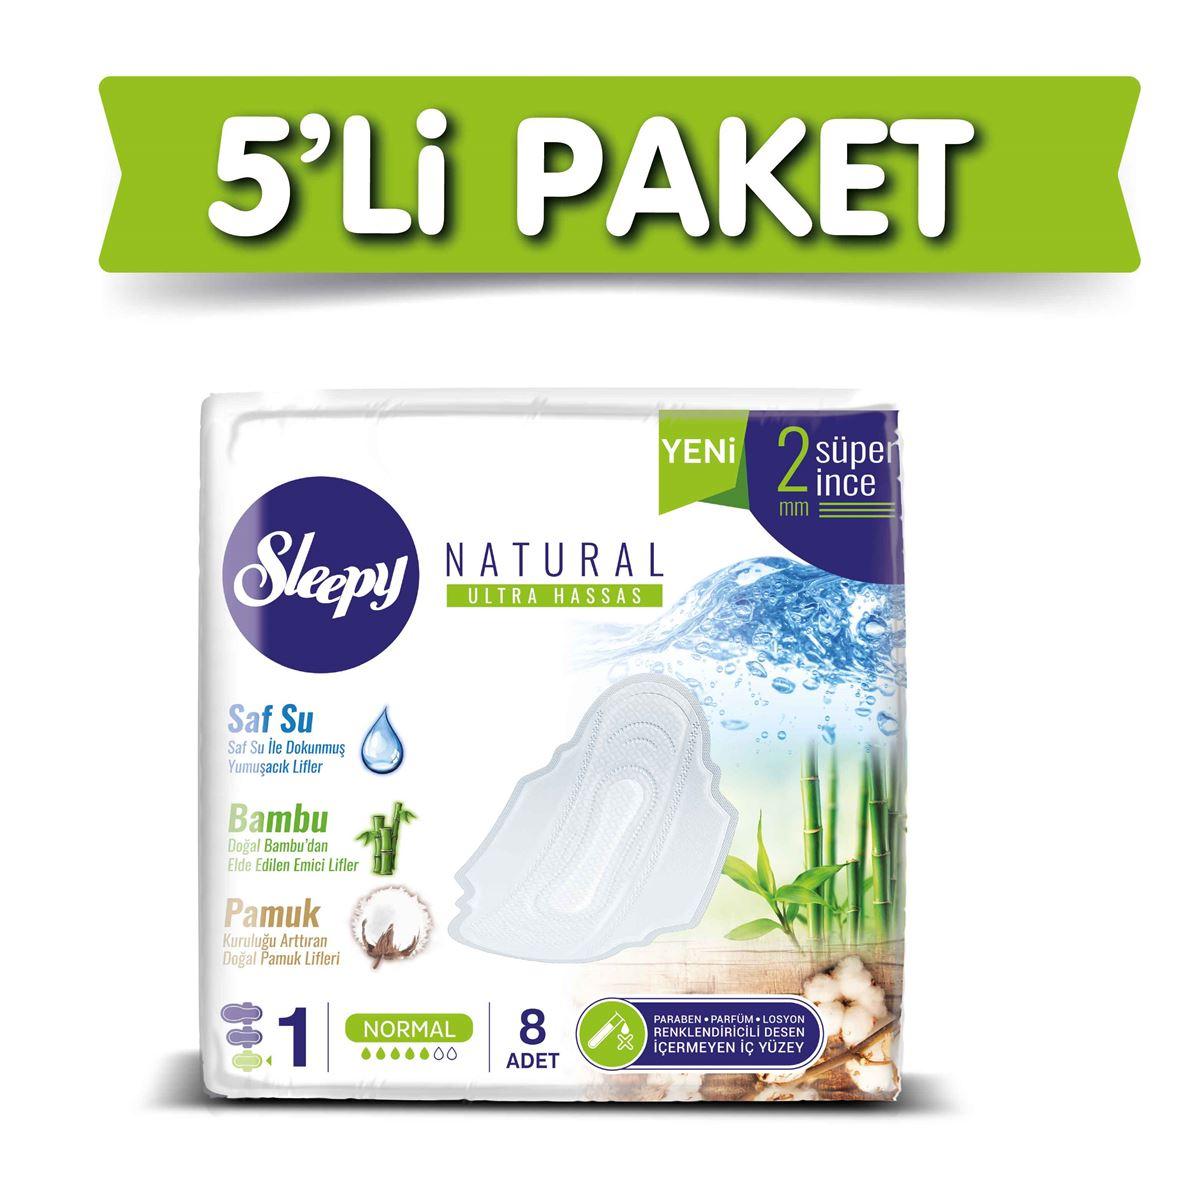 Sleepy Natural Ultra Hassas NORMAL (5x8 Ped)